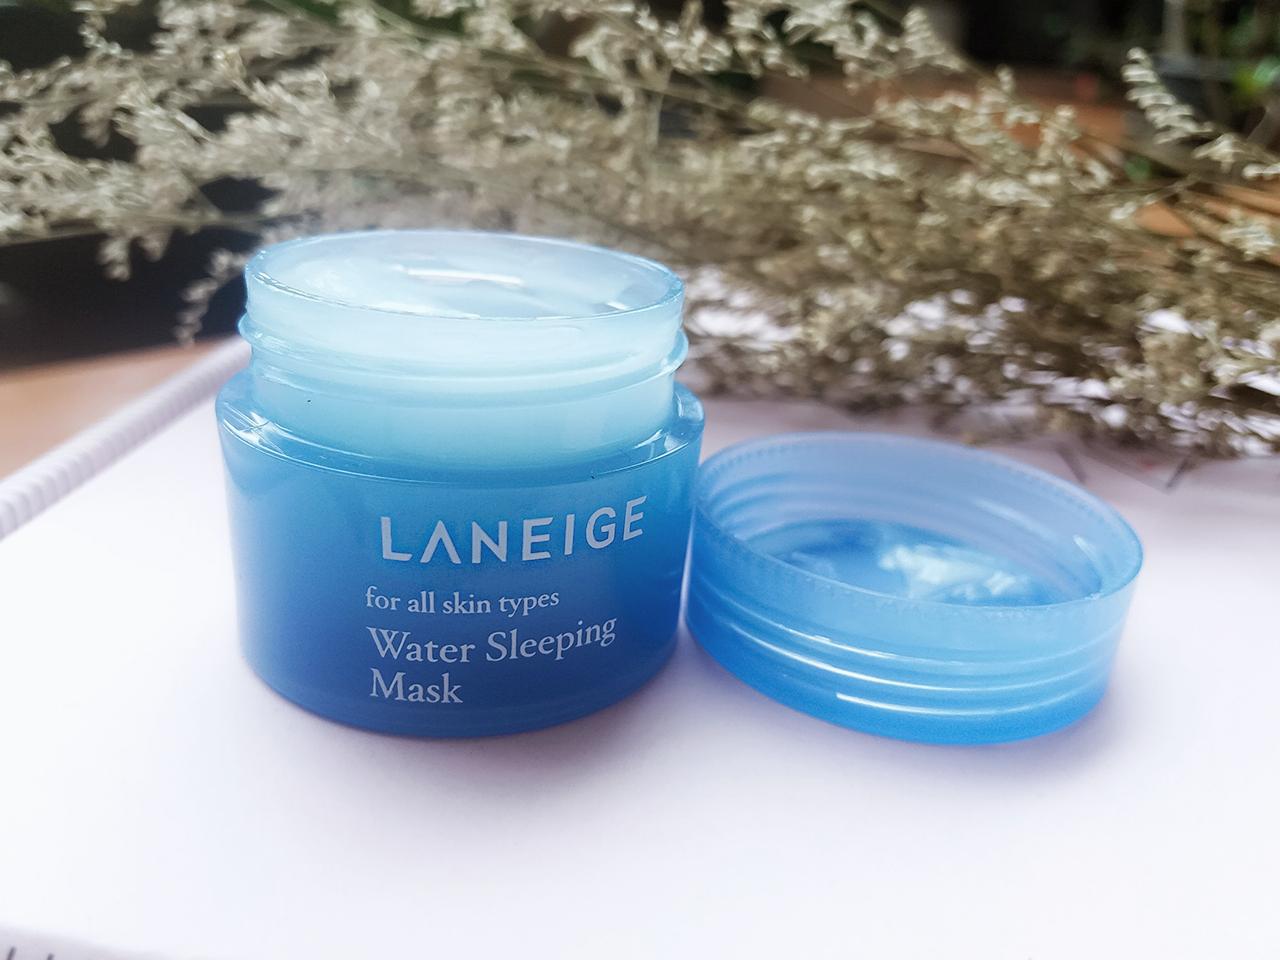 Review Laneige Water Sleeping Mask Travel Size Flawless Chen Lip Untuk Itu Hari Ini Aku Mau Sharing Tentang Yang Jadi Favoriteku Belakangan Its The Famous